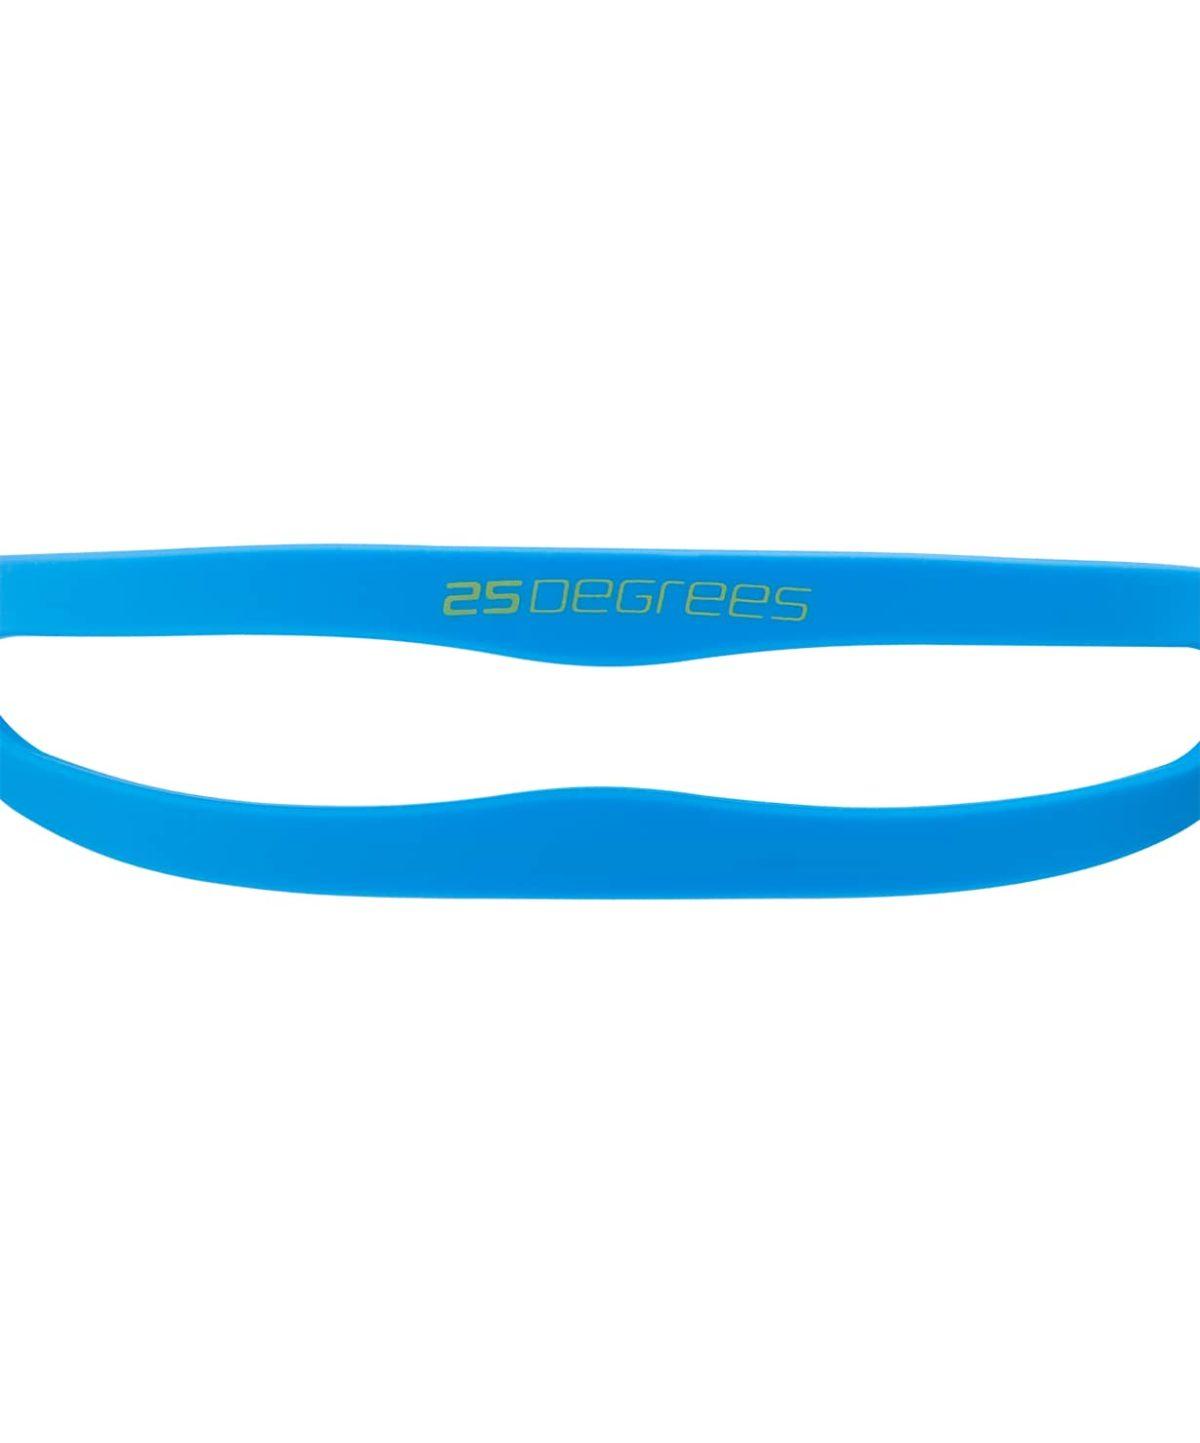 25DEGREES Очки-маска для плавания Hyper, детская  25D21018: голубой/лайм - 6